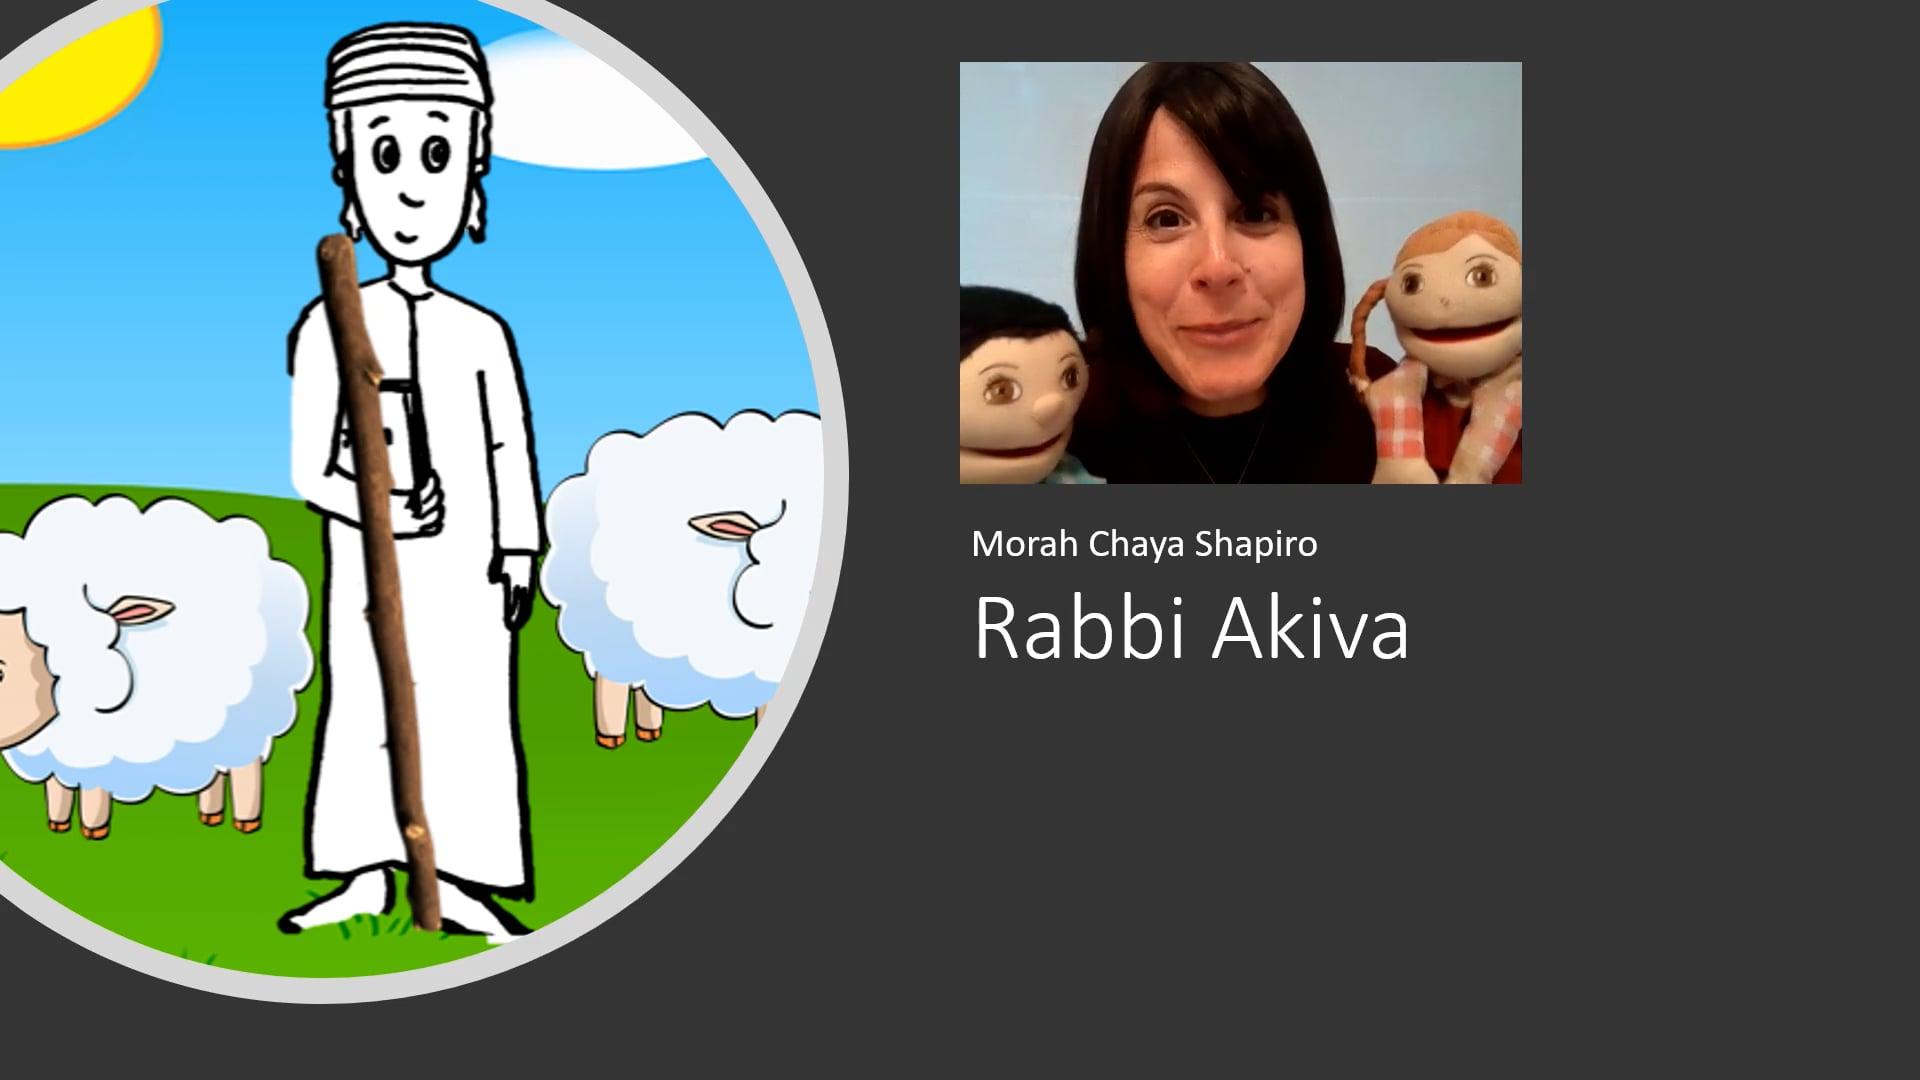 Morah Chaya - The Story of Rabbi Akiva